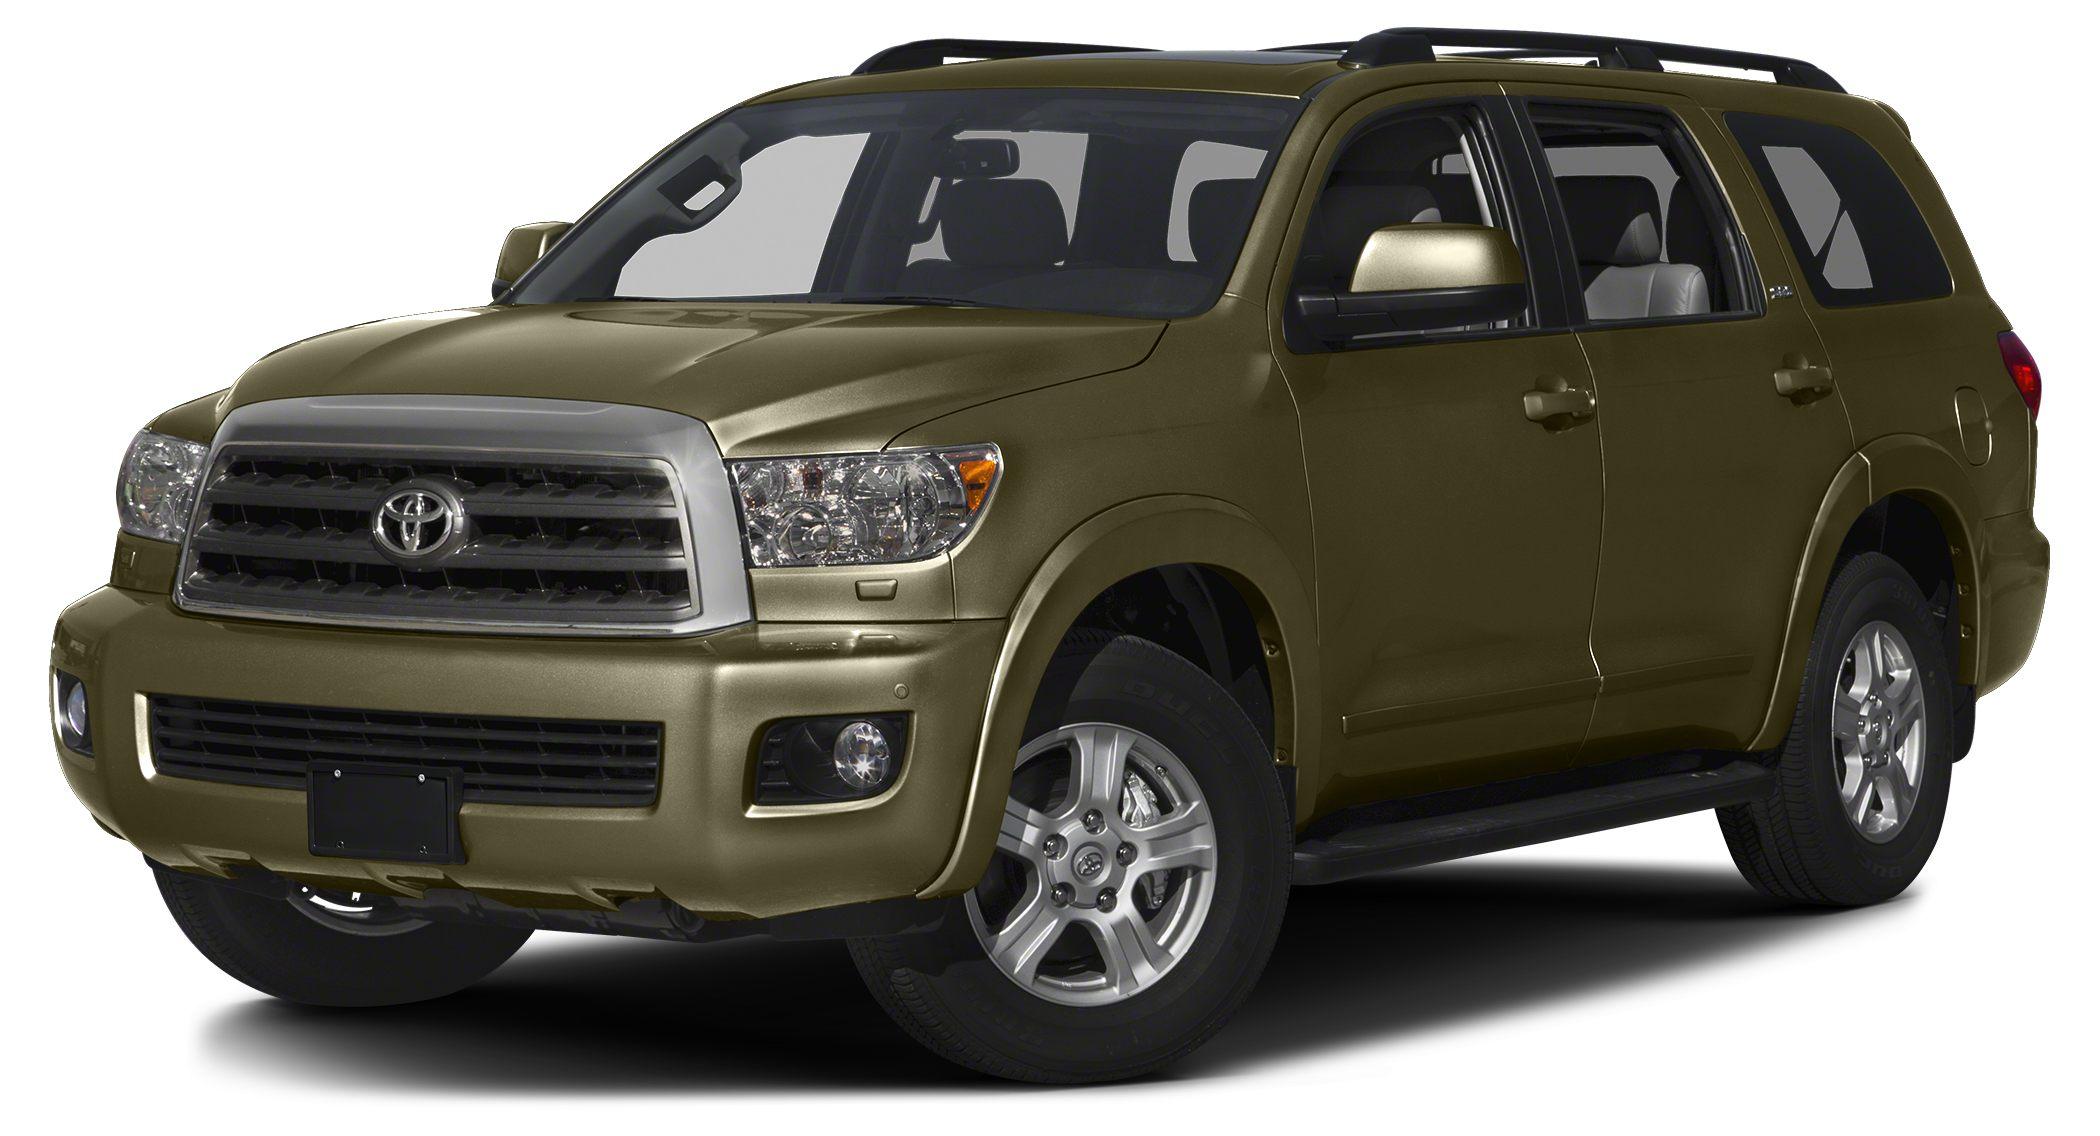 2016 Toyota Sequoia SR5 Miles 0Color Pyrite Mica Stock 64691 VIN 5TDZY5G14GS064691